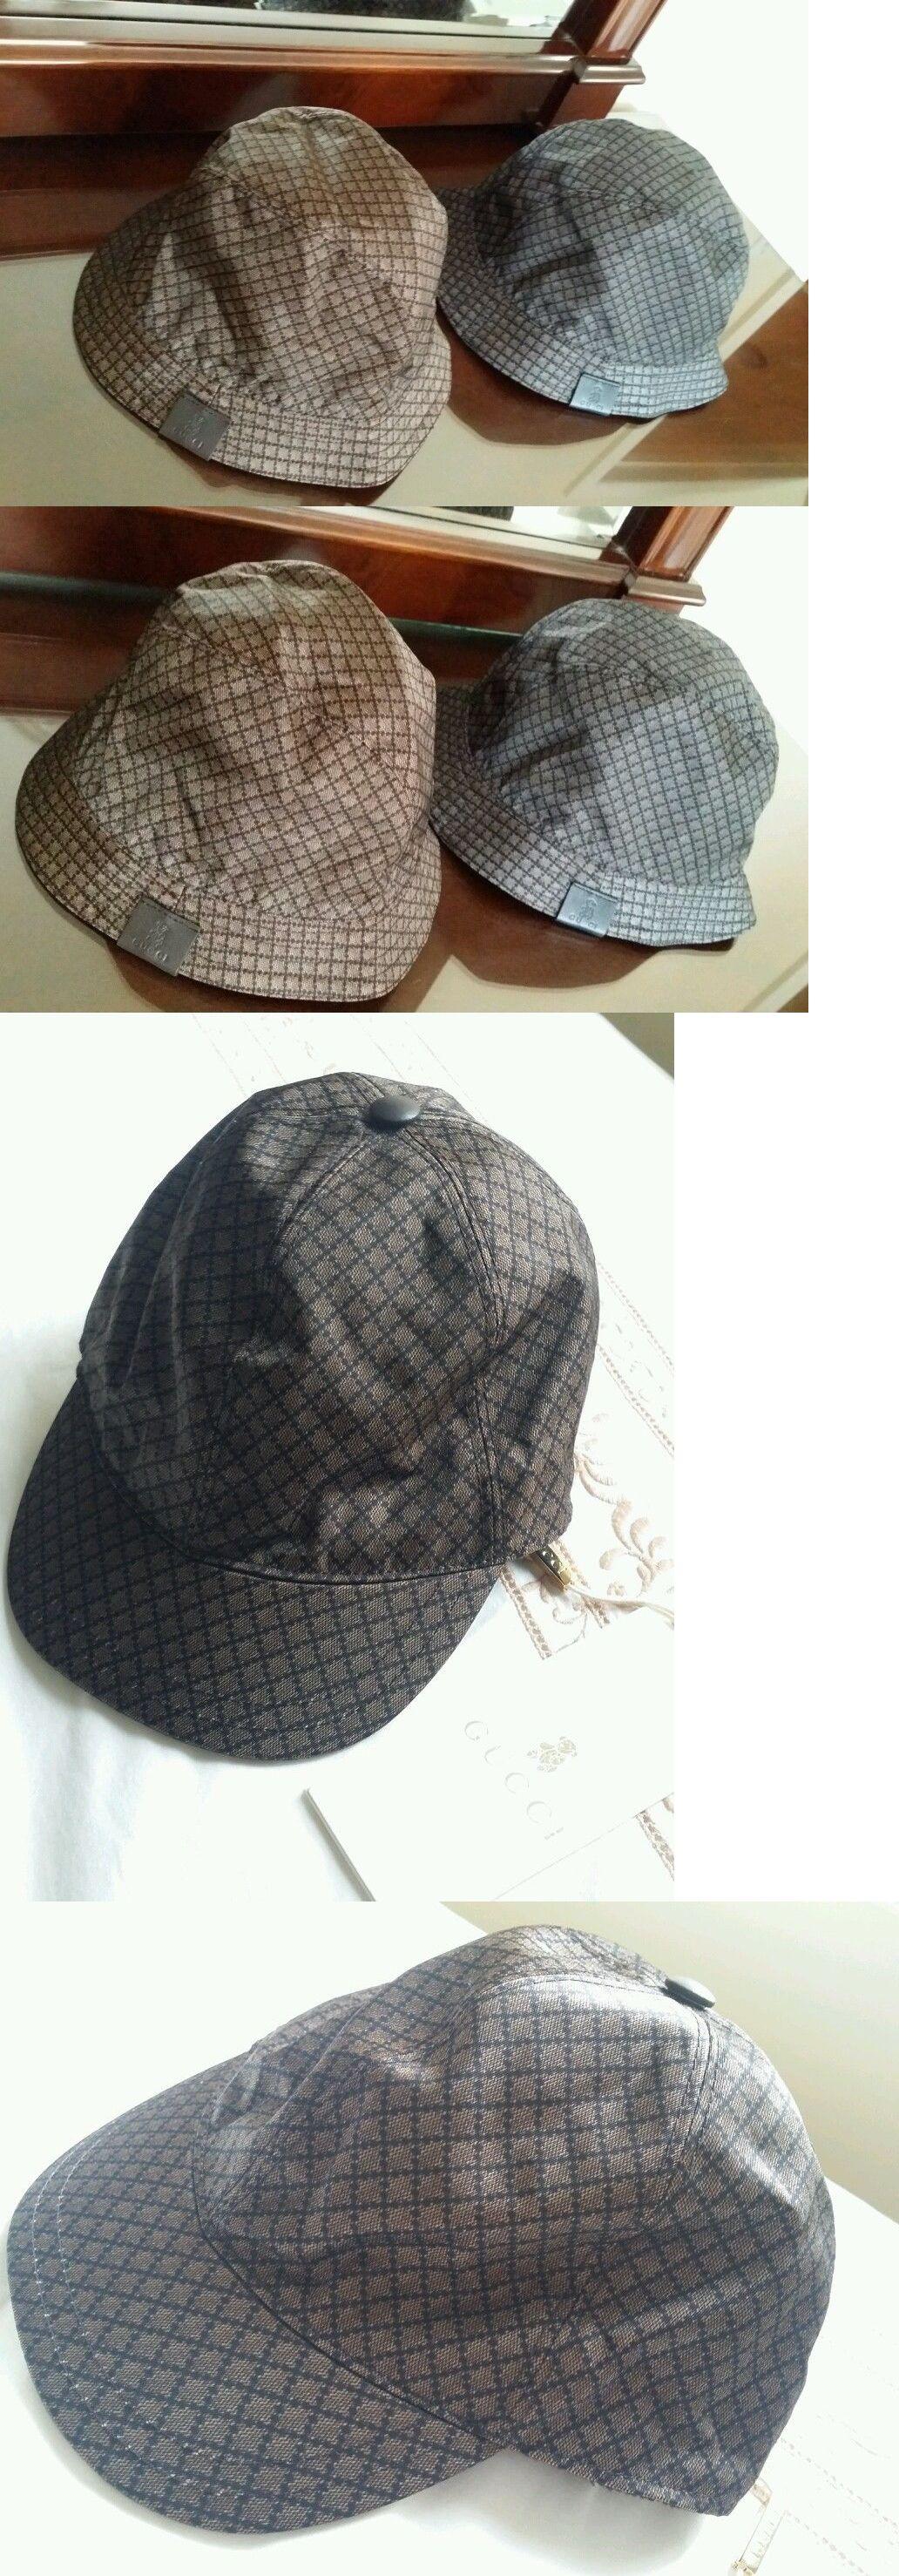 Hats 57884  Nwt New Gucci Junior Kids Boys Diamante Shiny Blue Black Or  Brown Fedora ab3142747d4